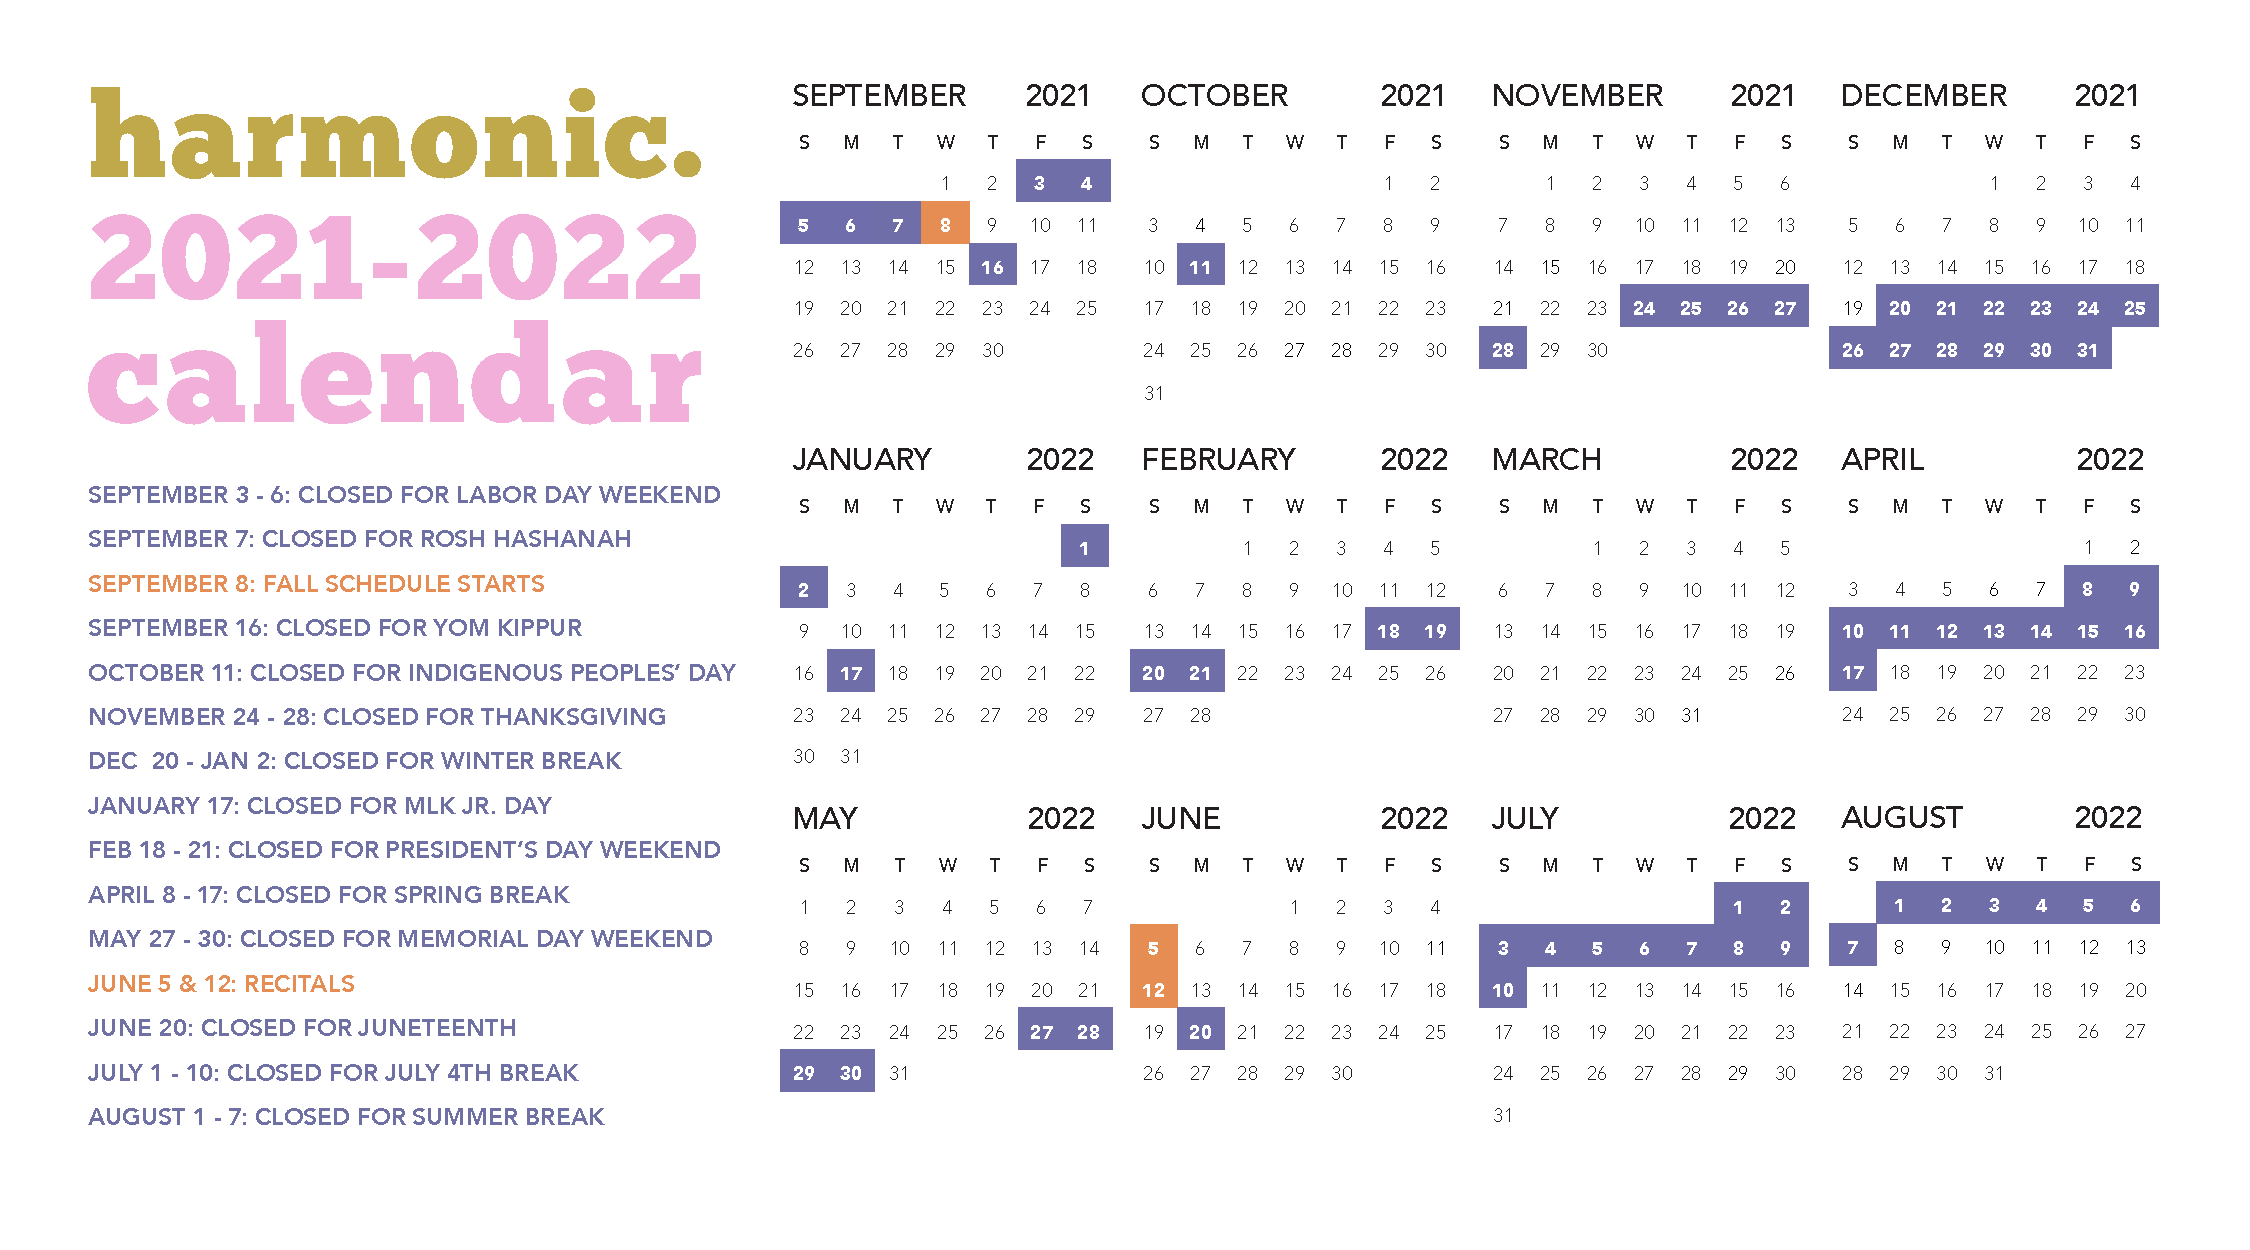 Harmonic Calendar - click to open in full size